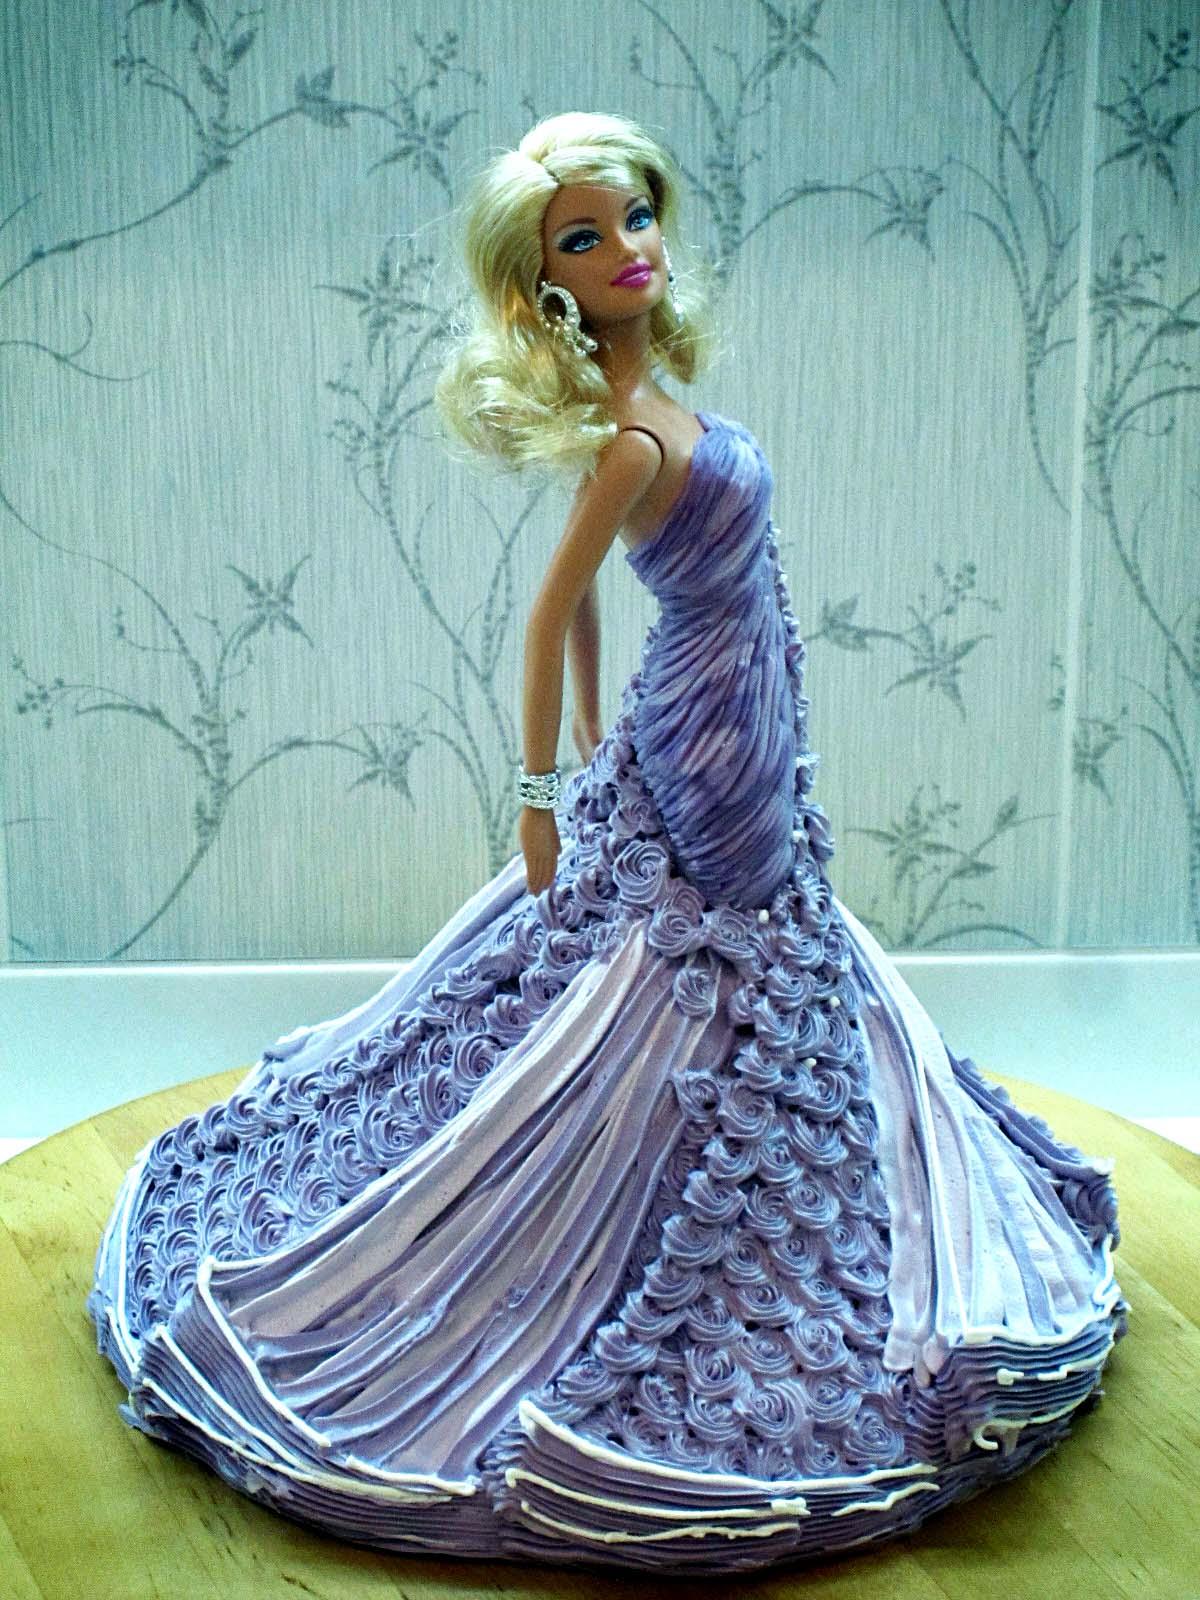 Торт кукла Барби из крема: мастер-класс торта Принцесса